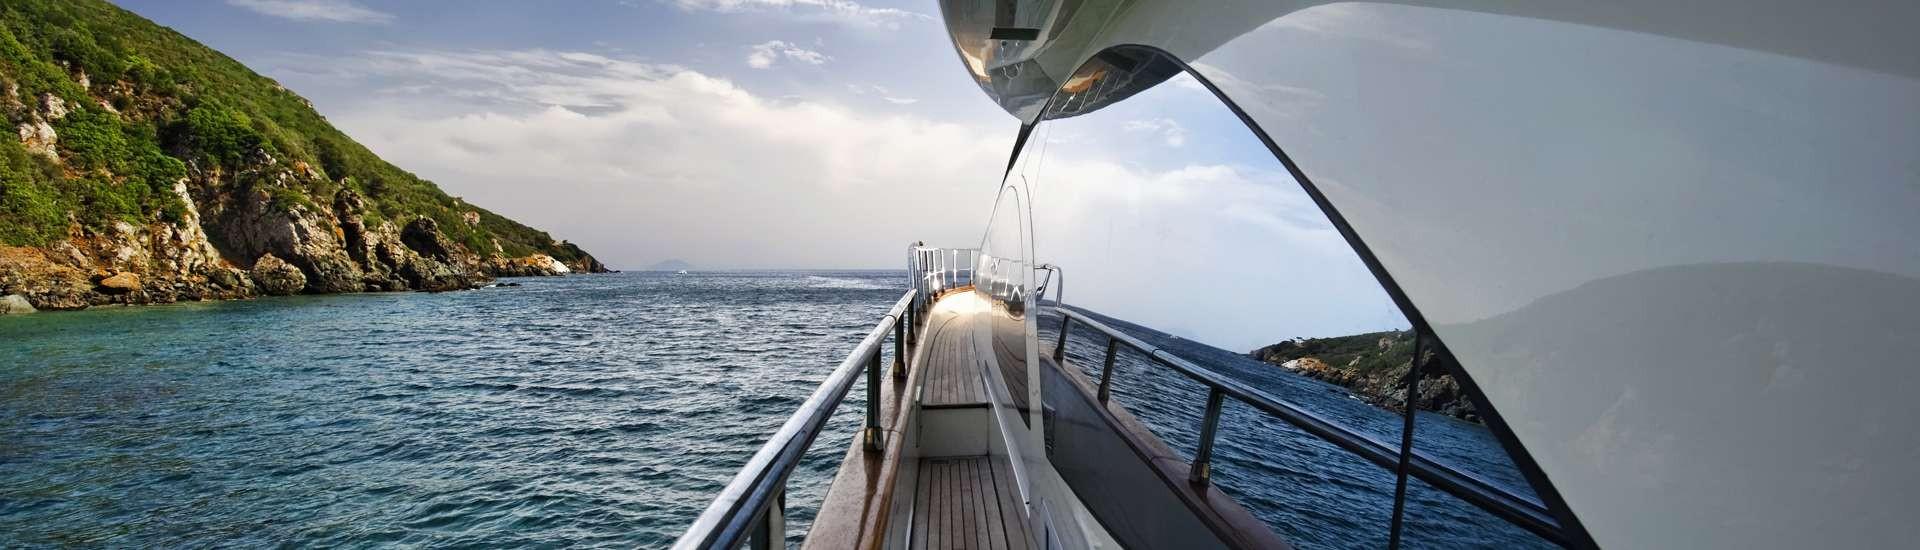 Croatia Motor Yachts rent